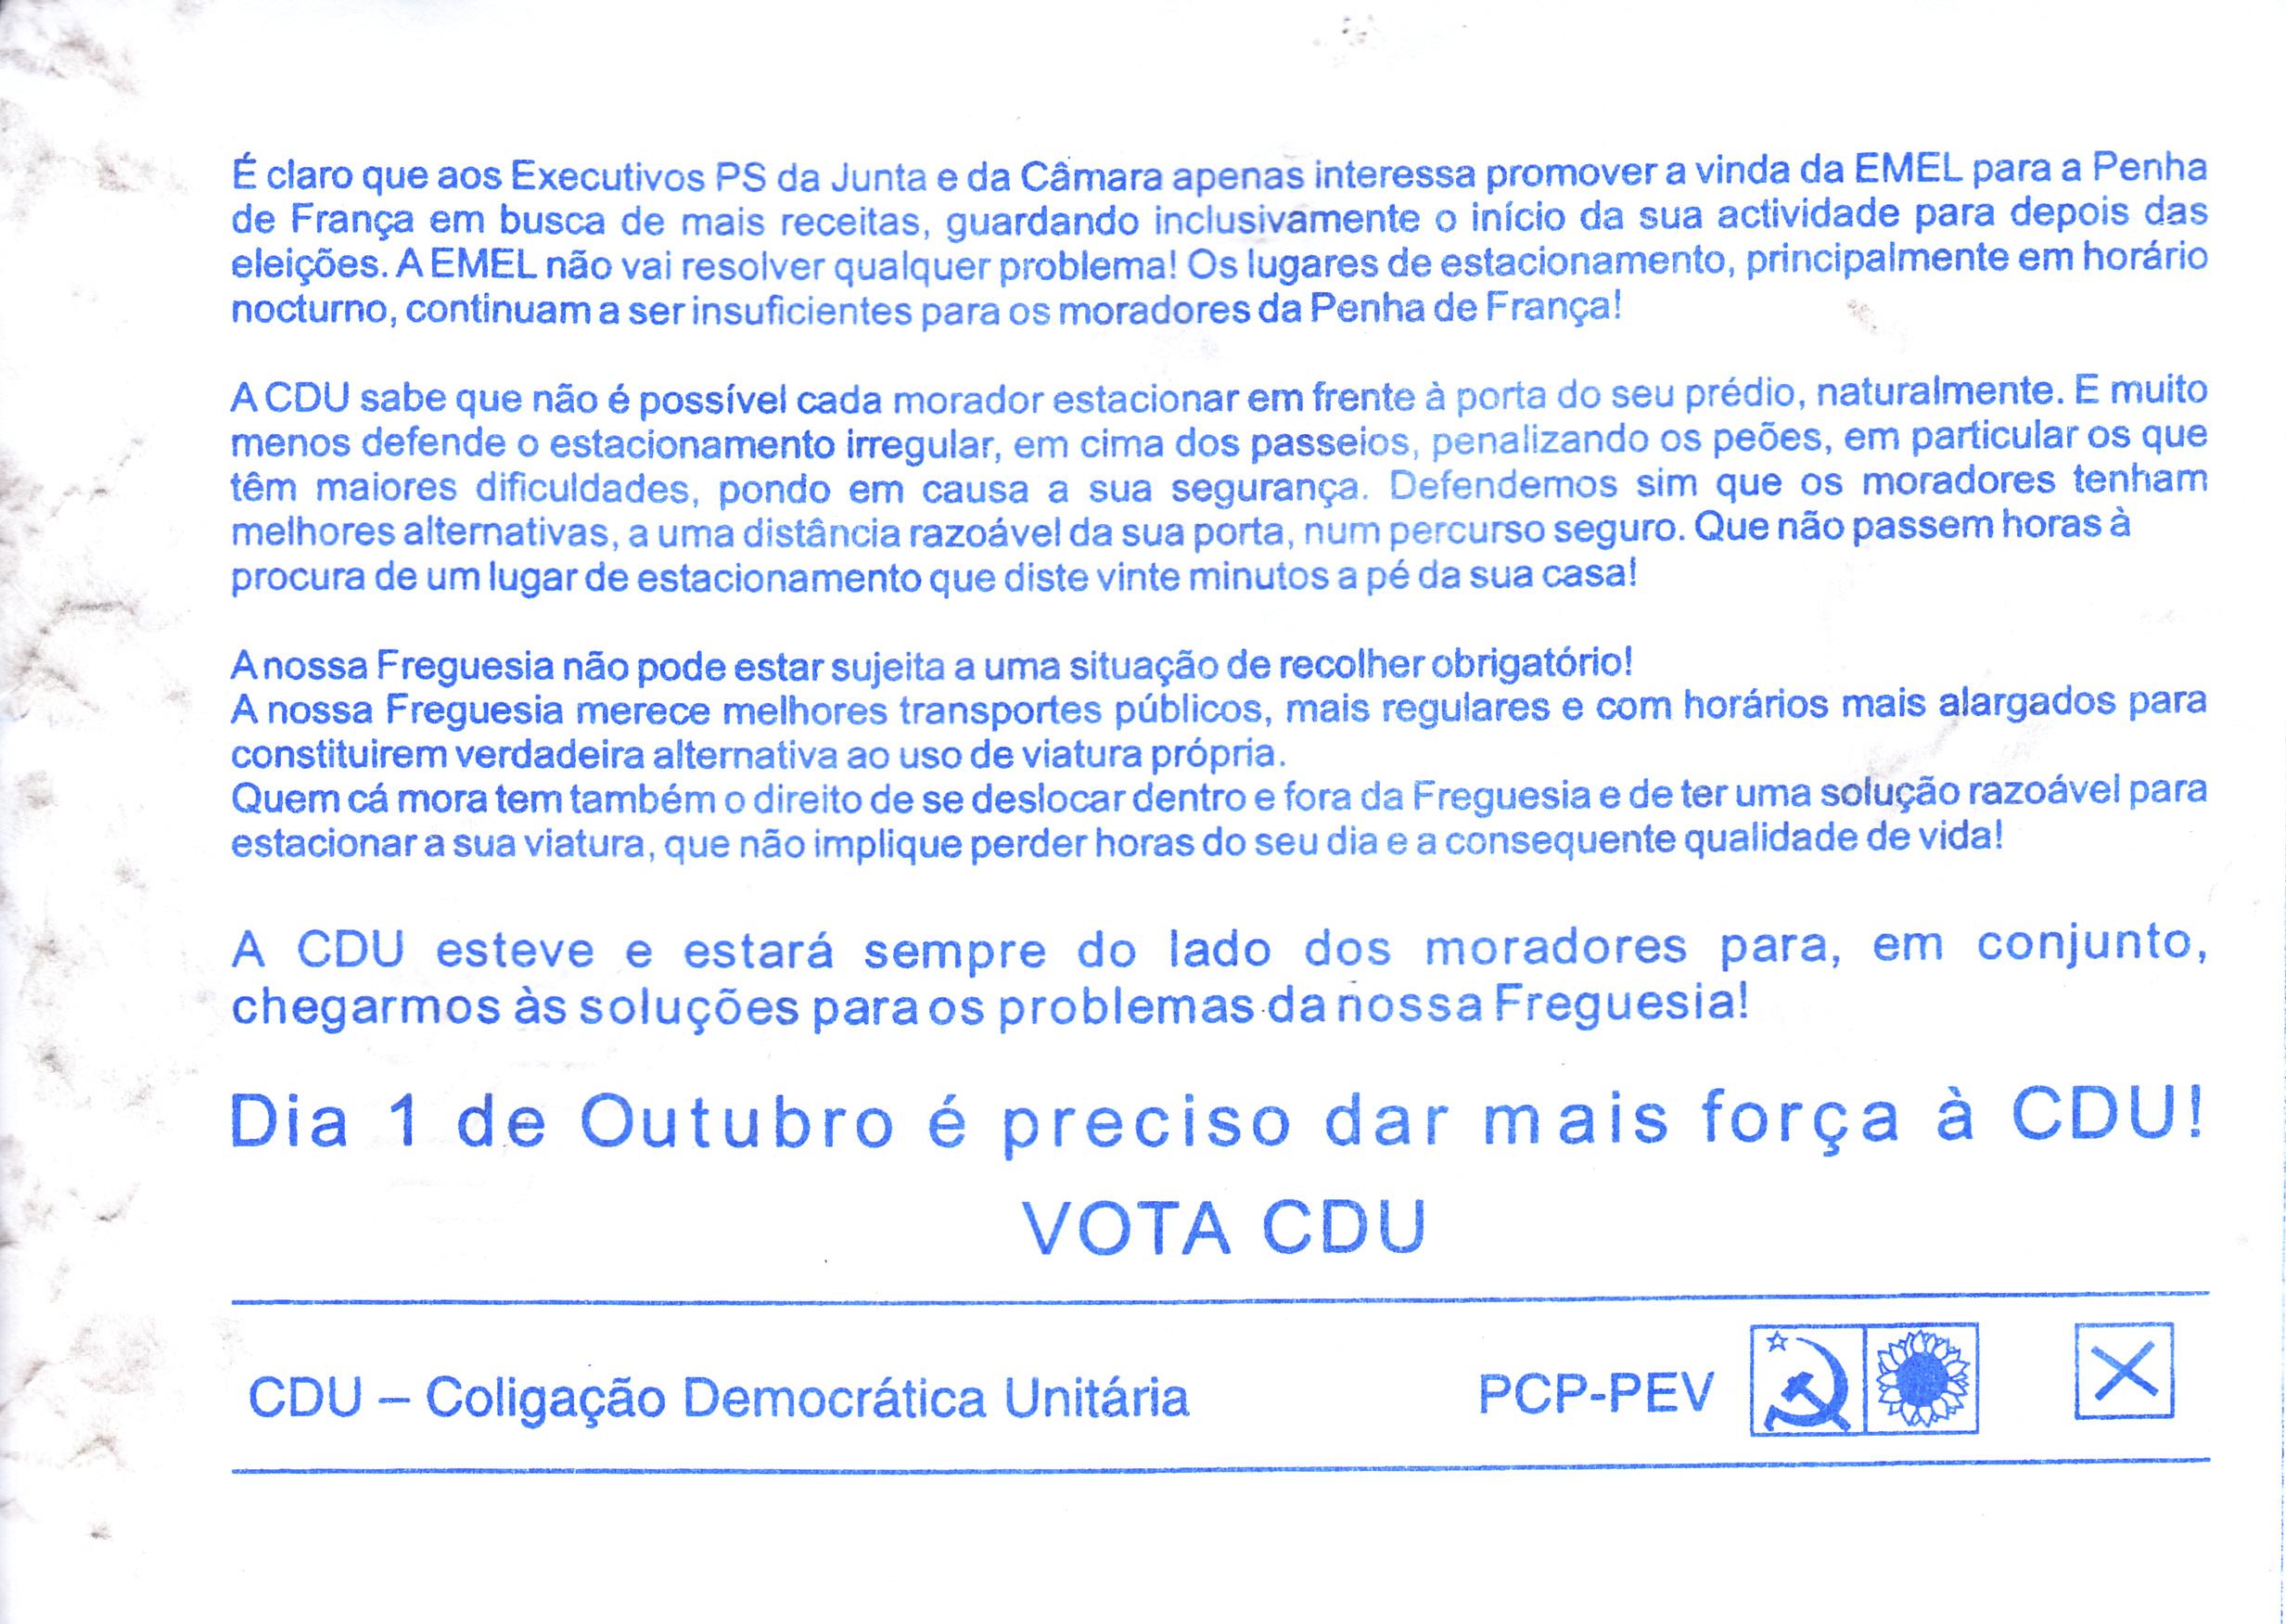 CDU_2017_Lisboa_Penha Franca_0002